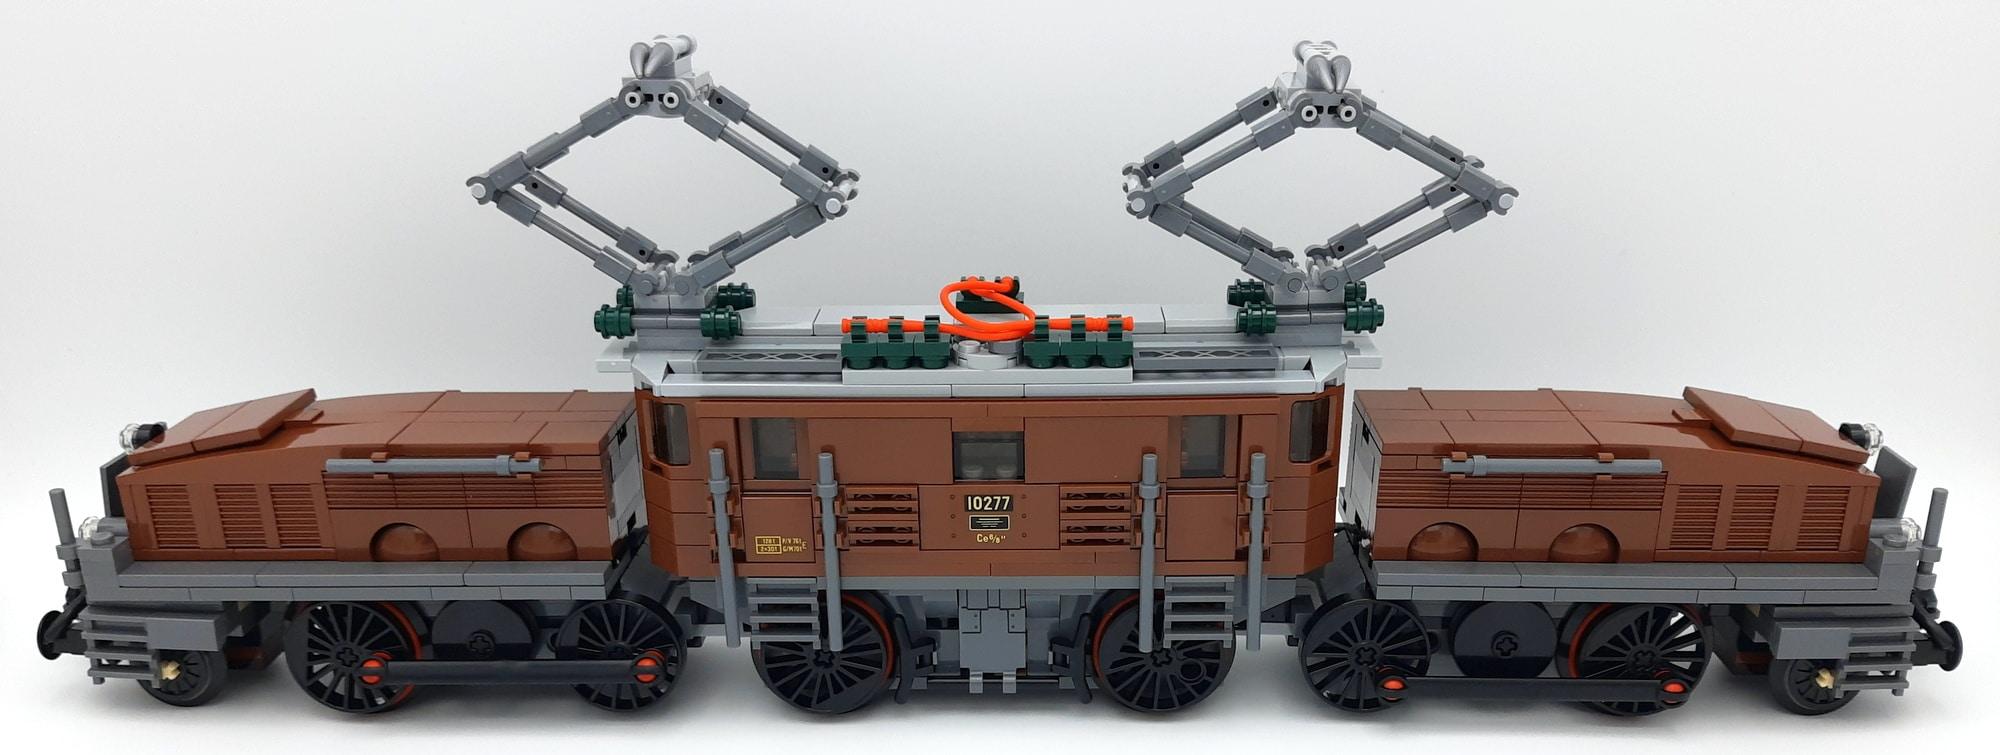 LEGO 10277 Krokodil Lokomotive - Zusammengesteckt